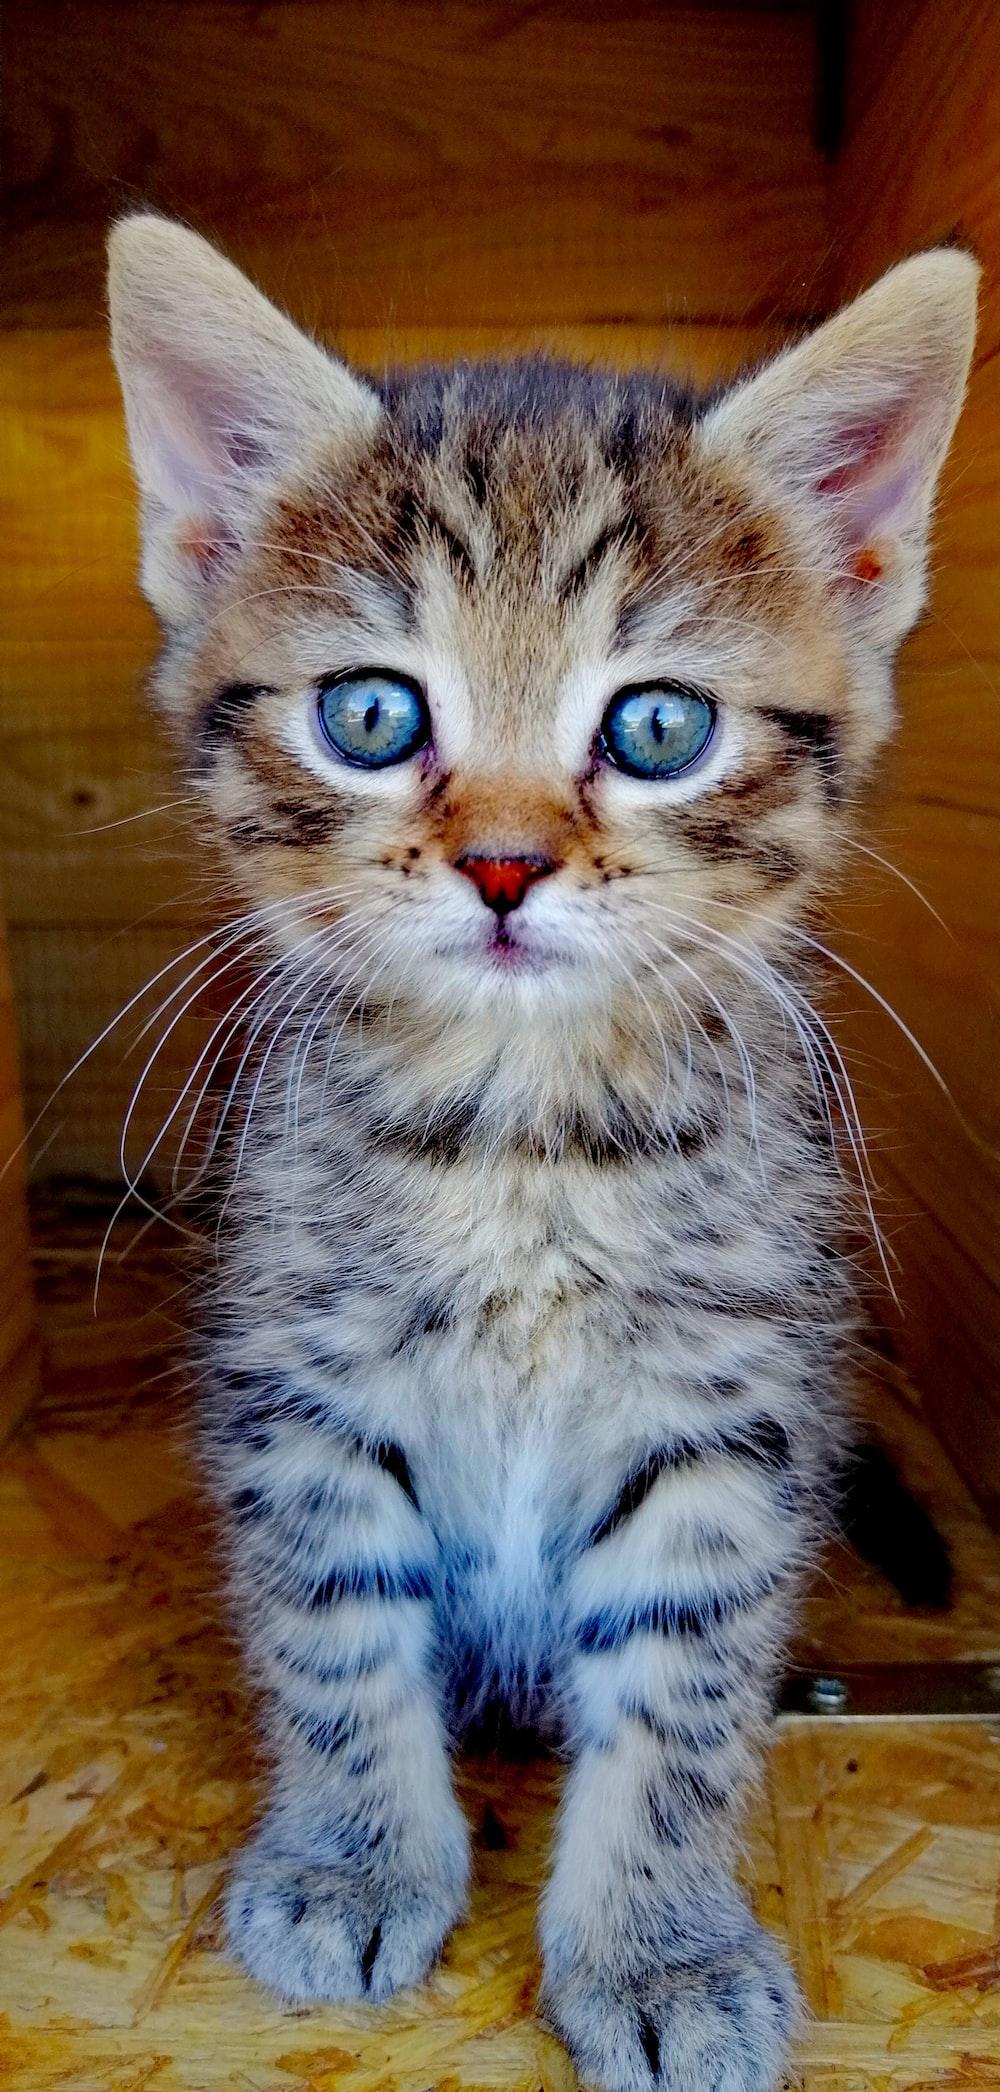 brown tabby cat on brown wooden floor